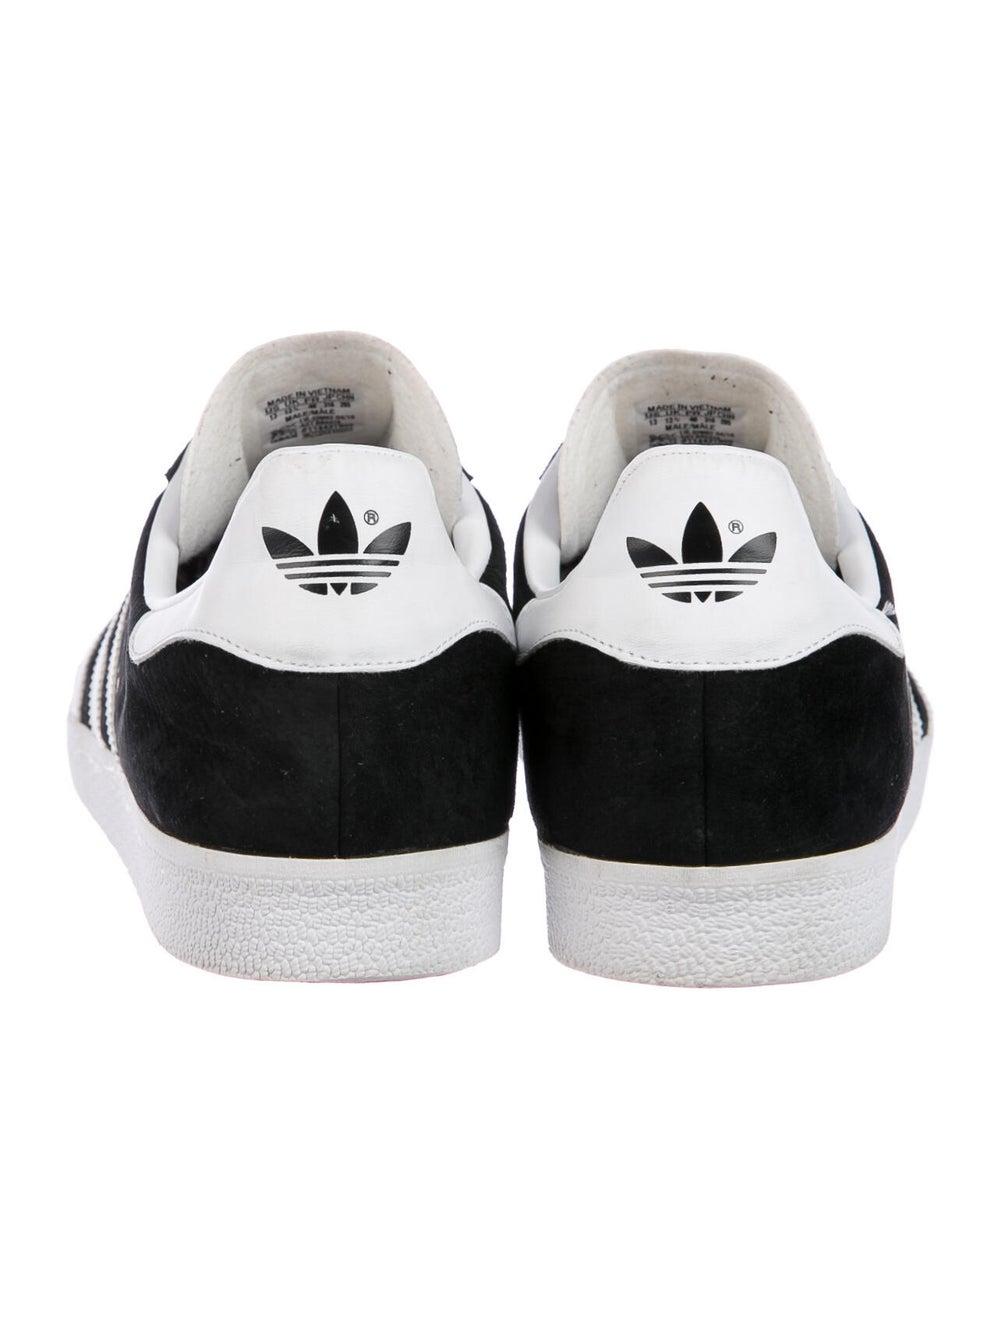 Adidas Gazelle Sneakers Black - image 4